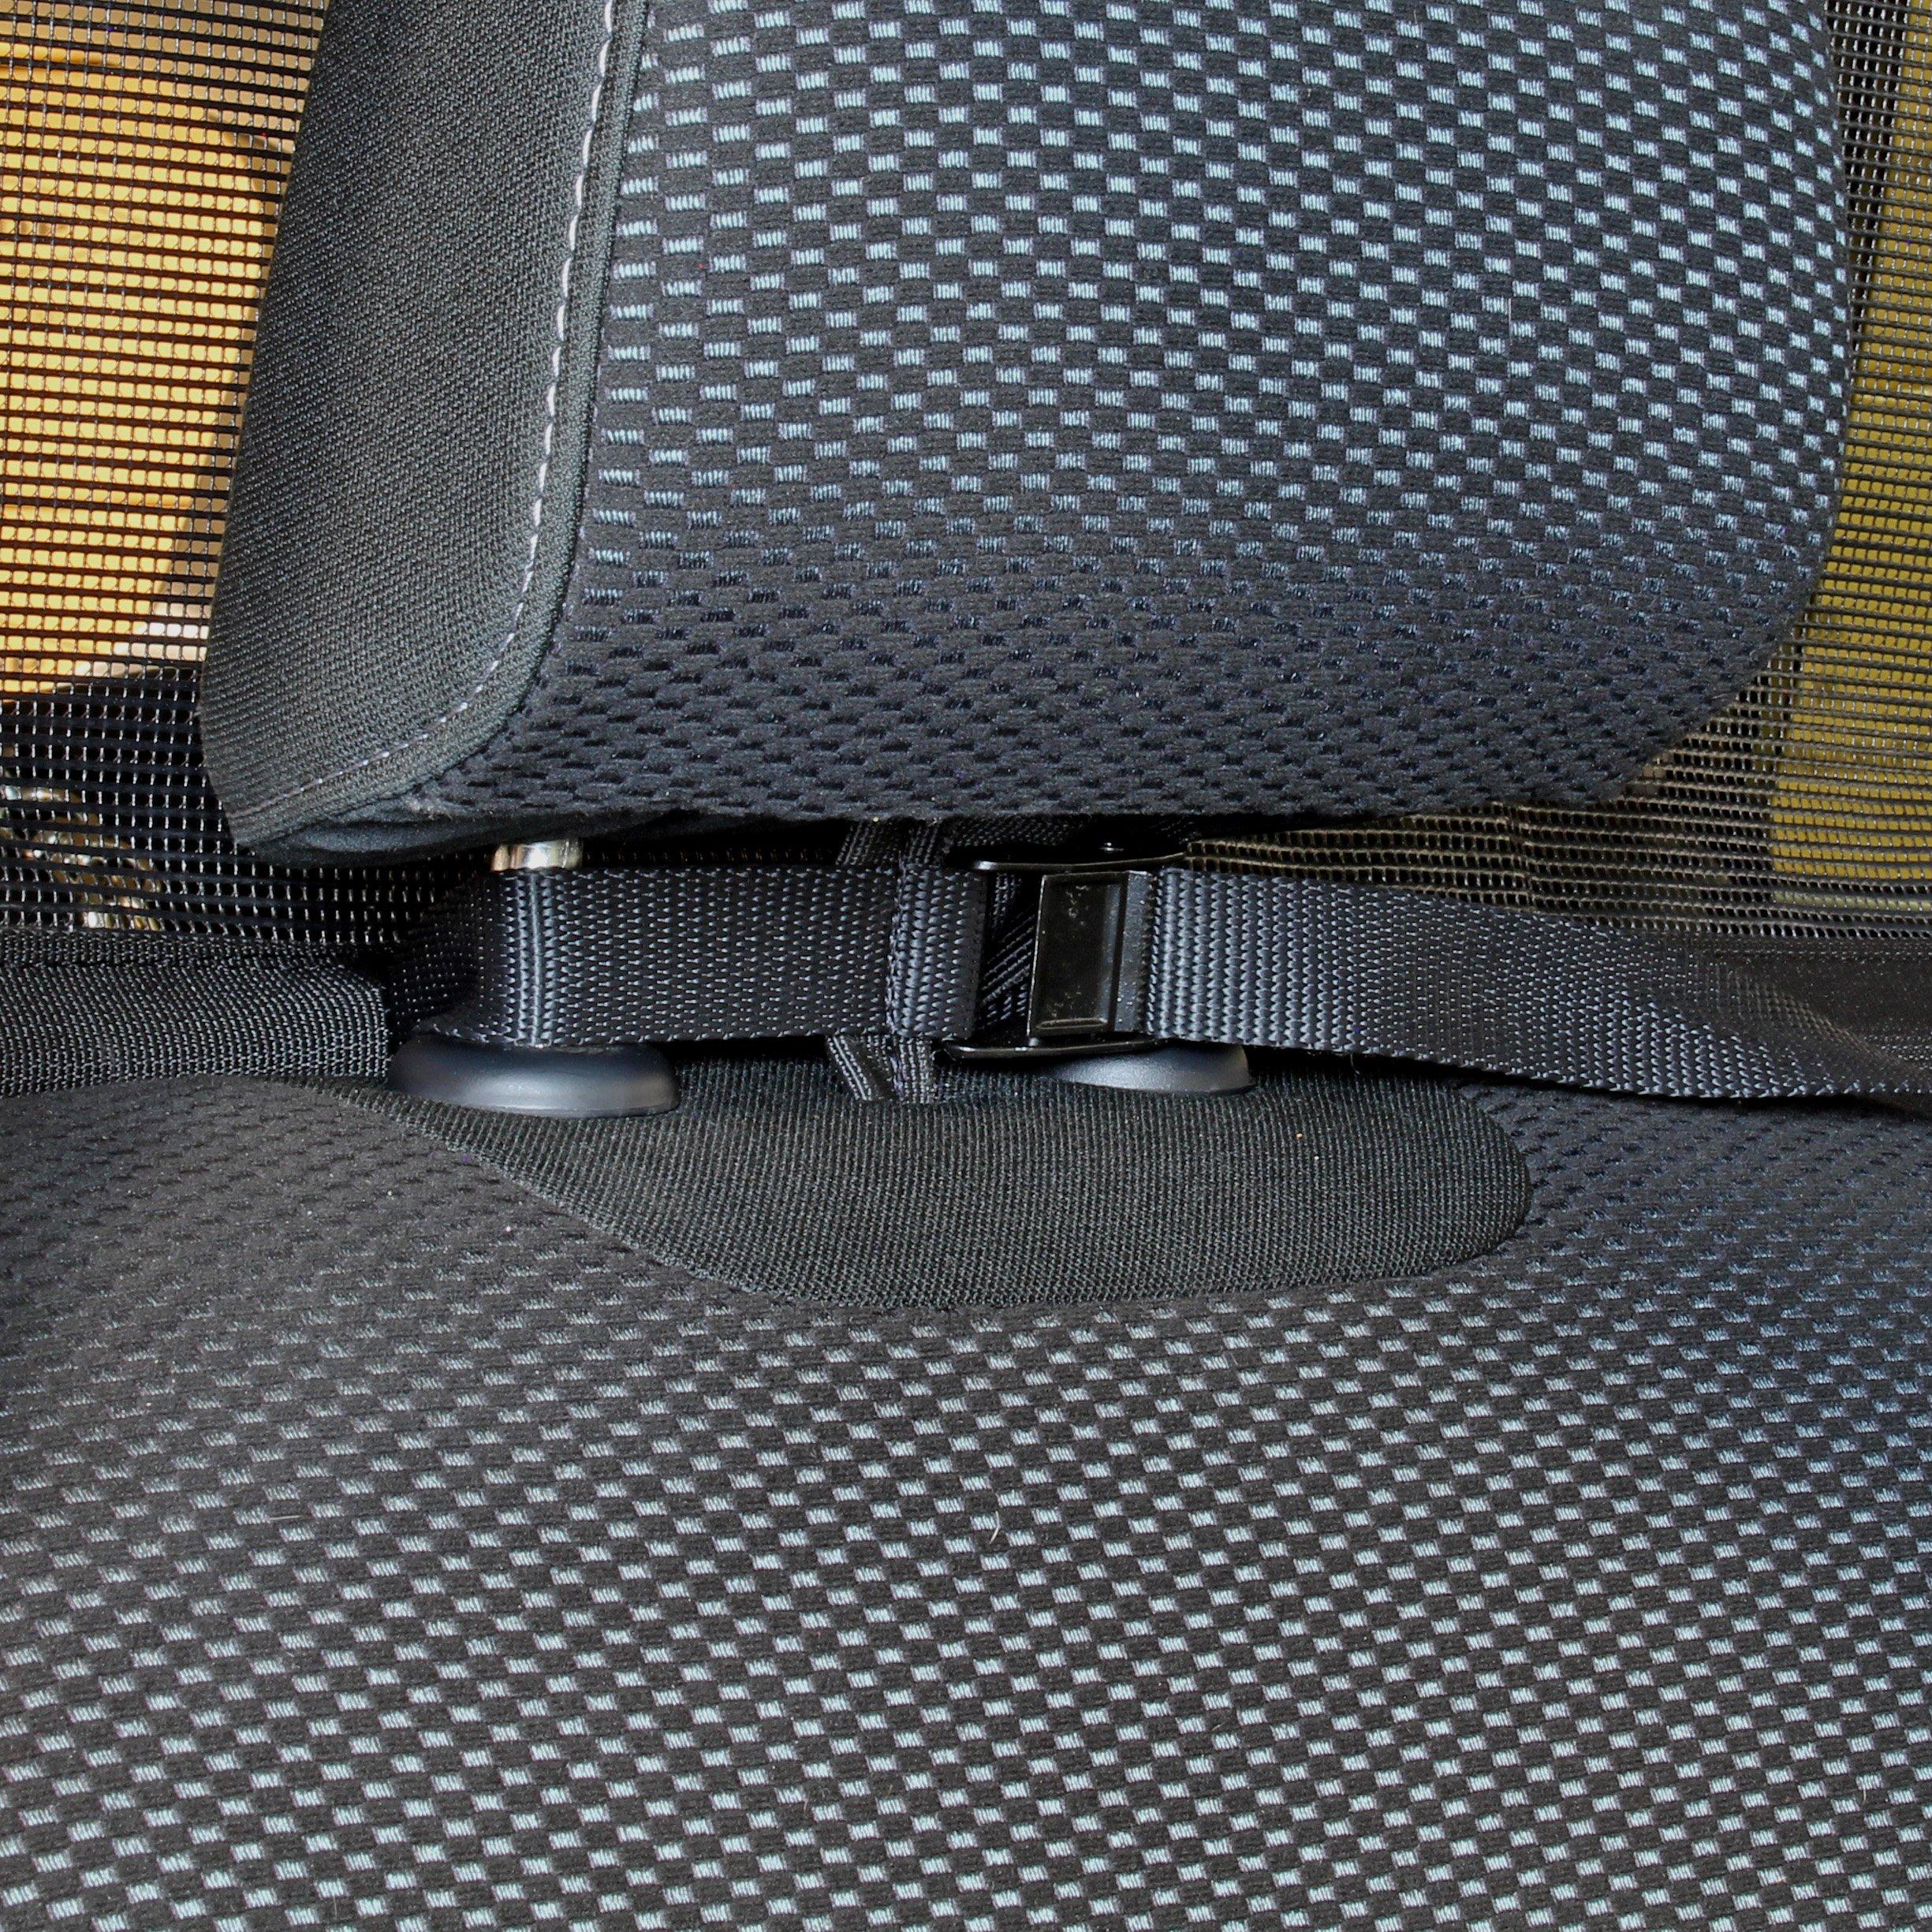 Bushwhacker - Paws n Claws Deluxe Dog Barrier 56'' Wide - Ideal for Trucks, Large SUVs, Full Sized Sedans - Pet Restraint Car Backseat Divider Vehicle Gate Cargo Area Travel Trunk Mesh Net Screen by Bushwhacker (Image #3)